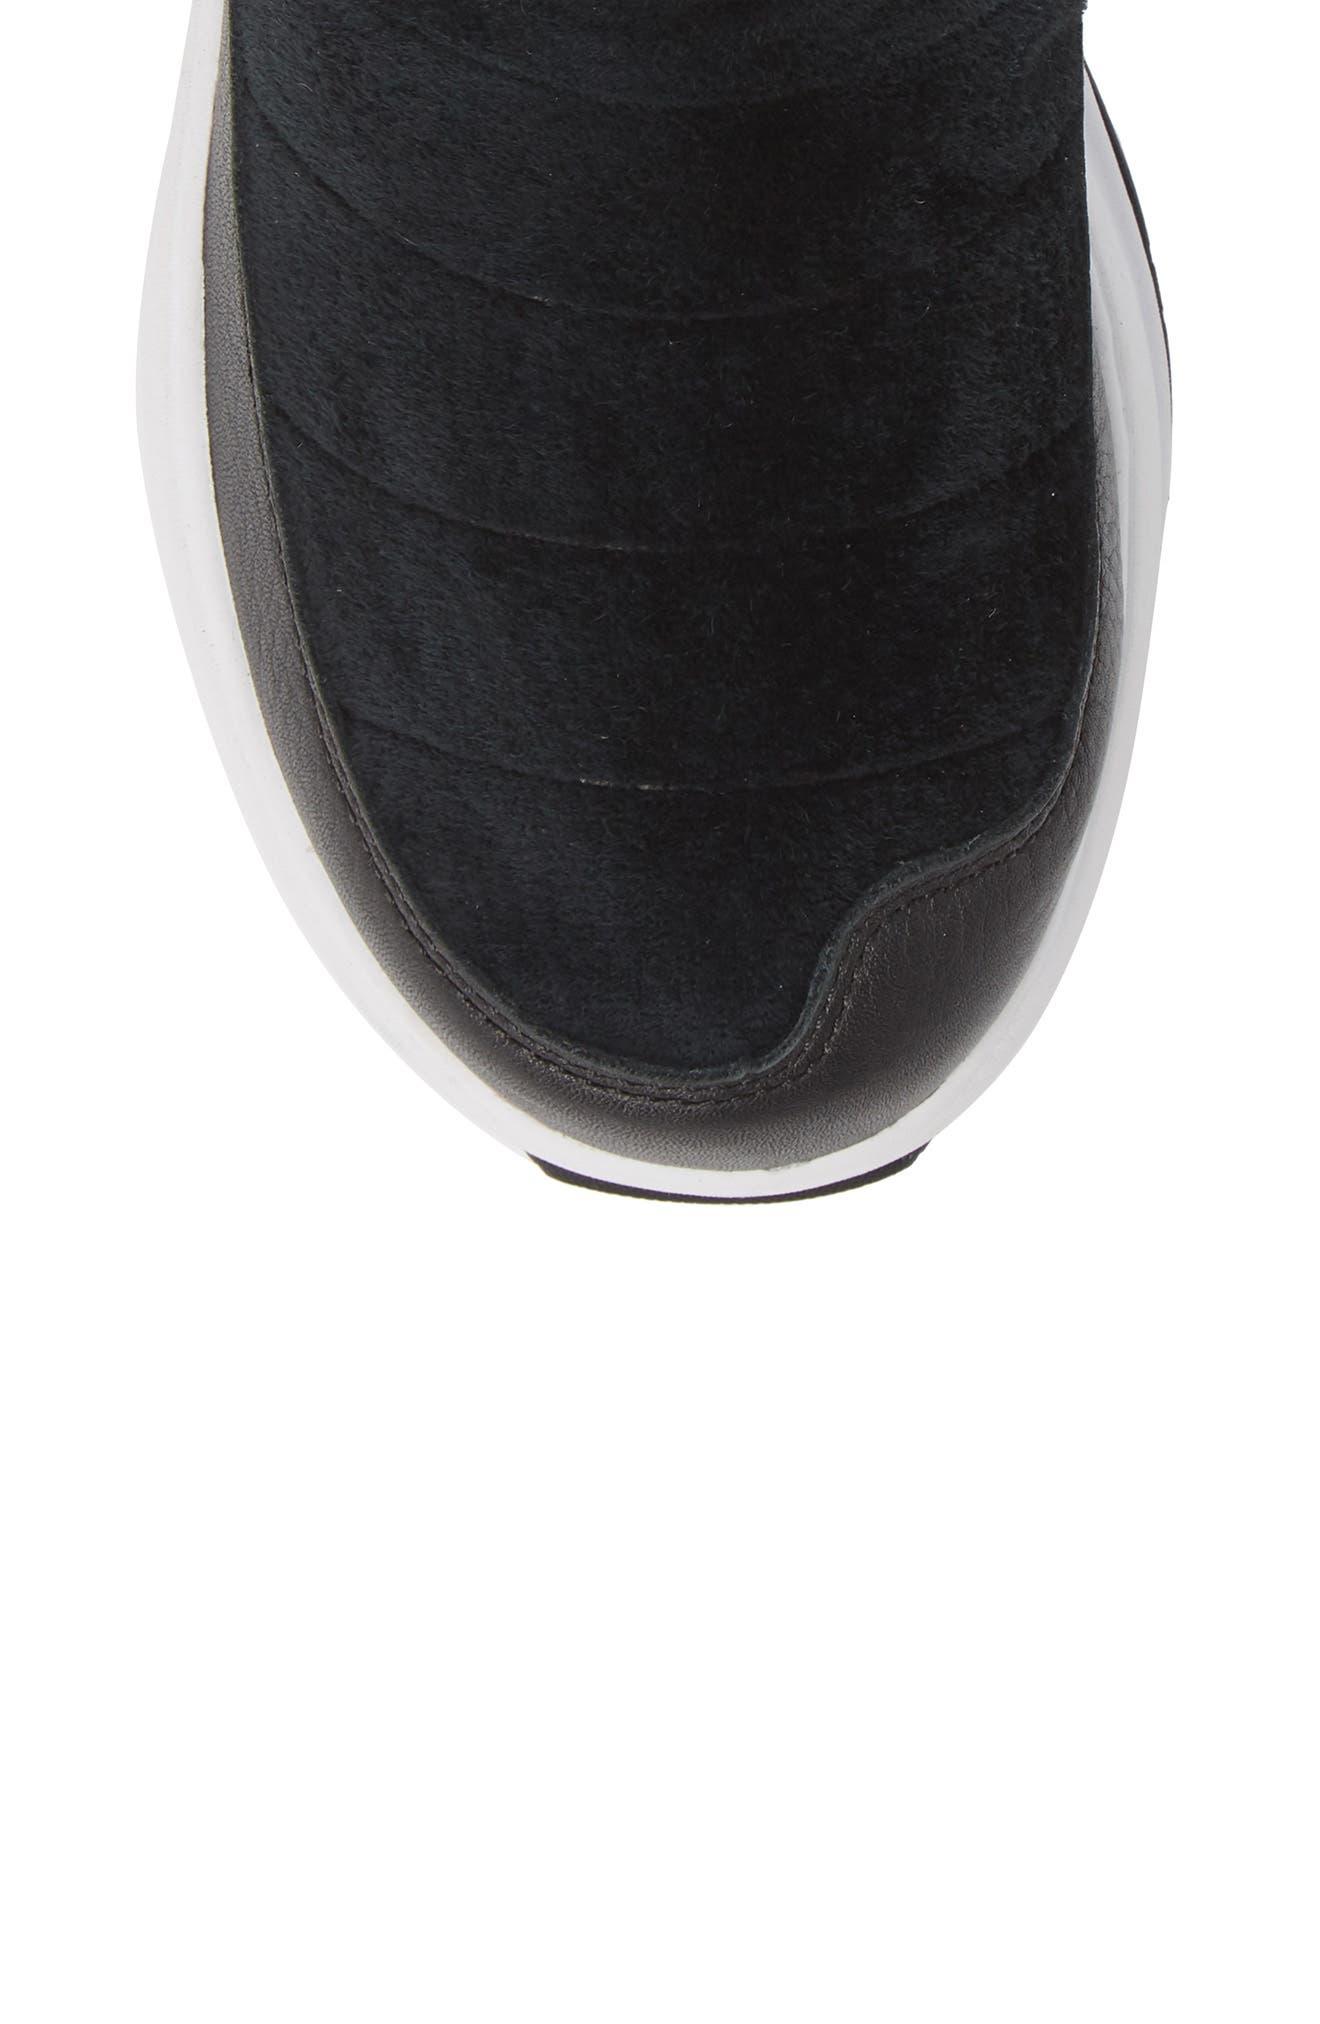 Ozone Park Waterproof Boot,                             Alternate thumbnail 5, color,                             BLACK/ WHITE